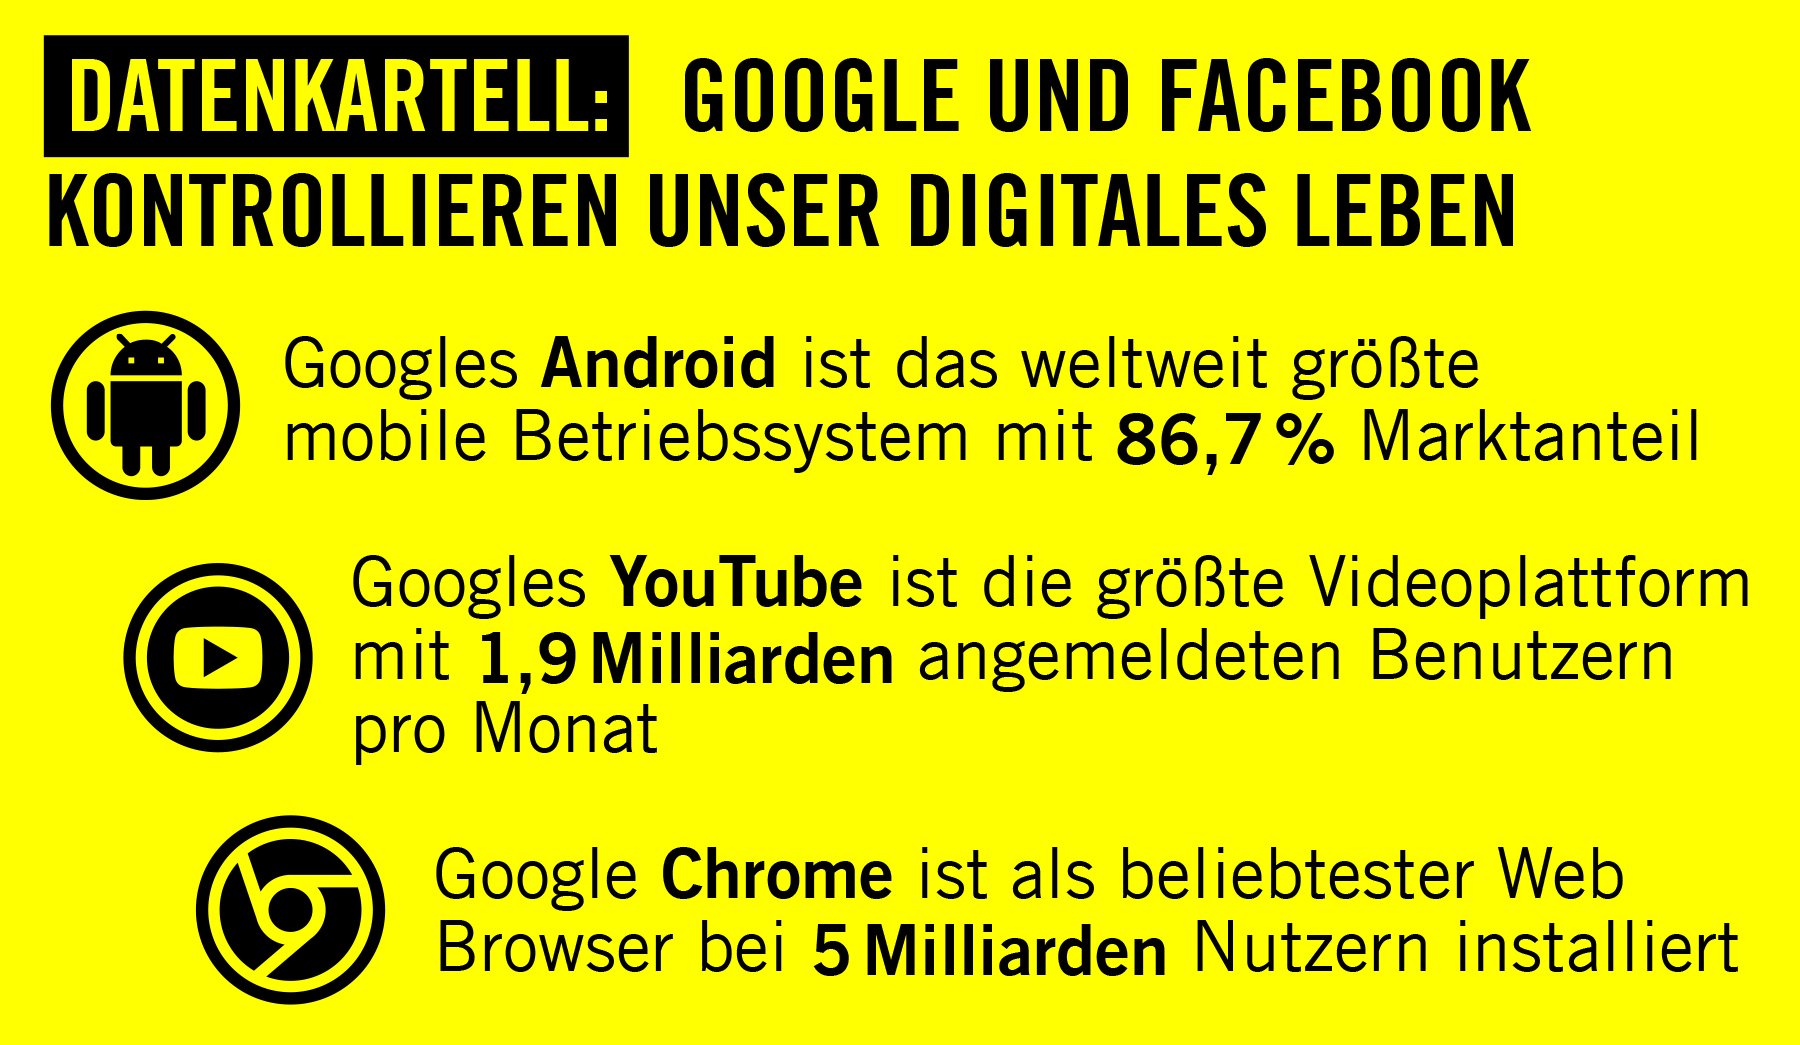 Datenkartell-Facebook-Google-Big-surveillance-report-2 1800x945 | © Amnesty International